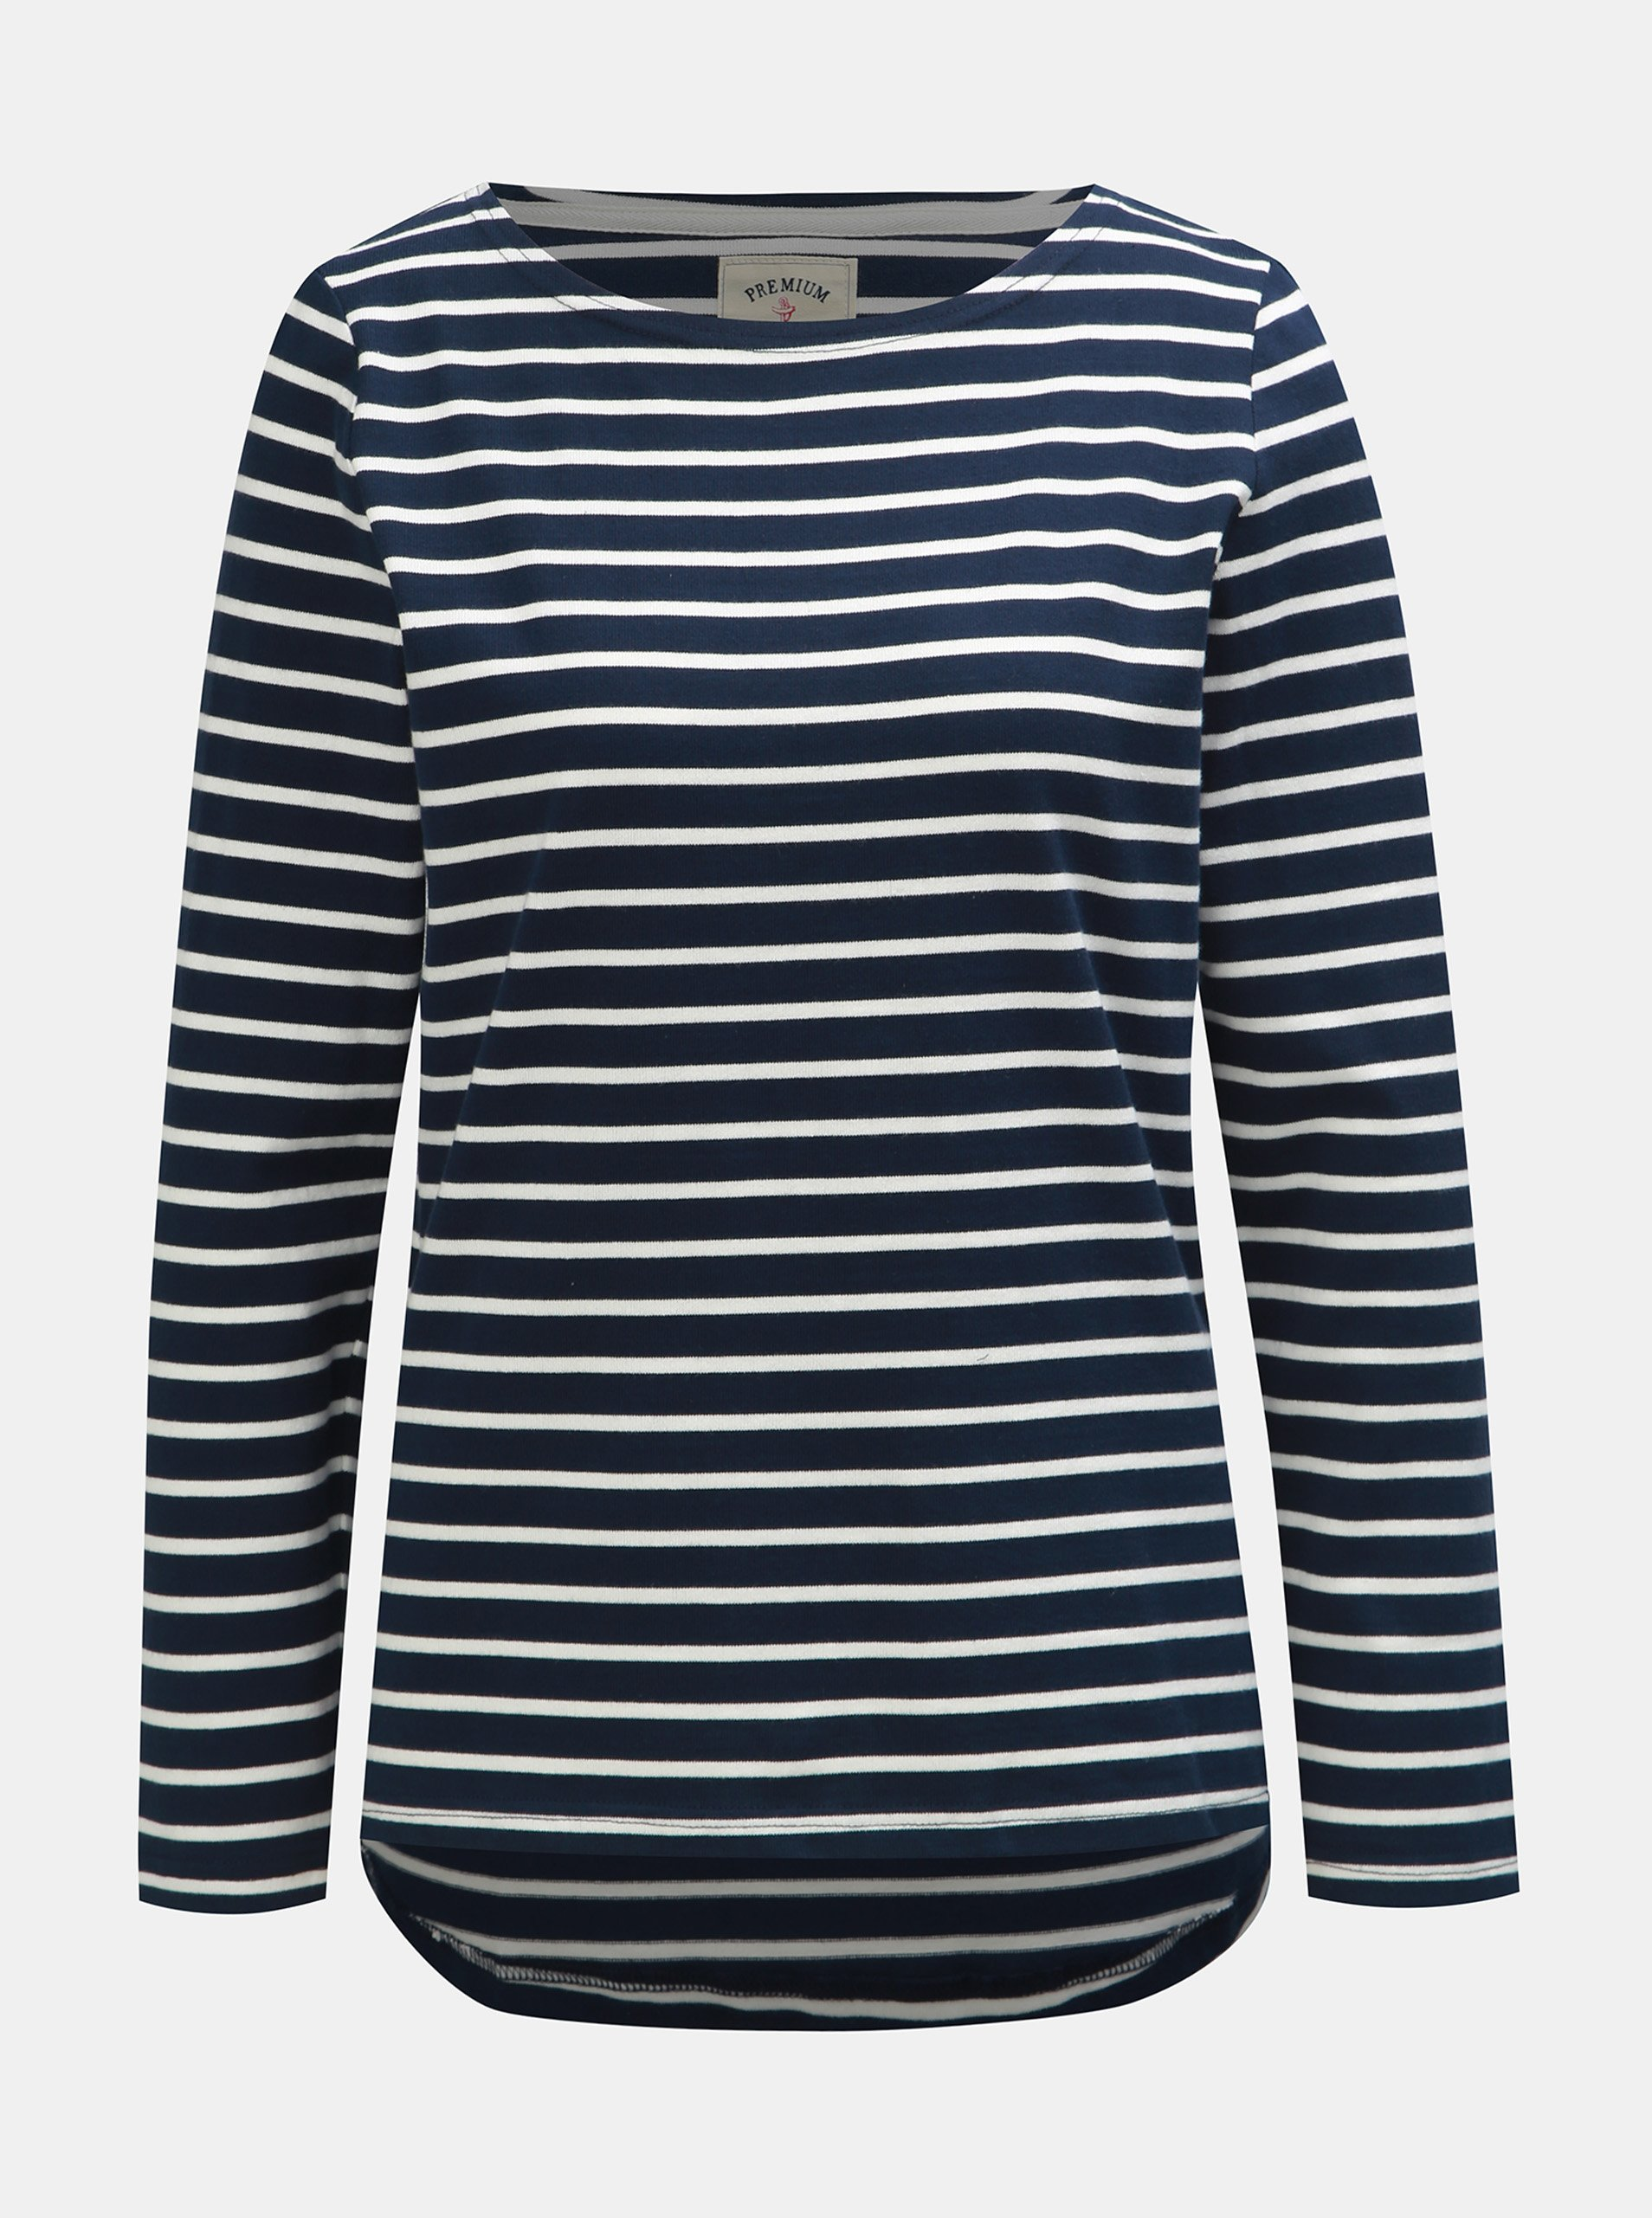 b640750641c Bílo-modrý dámský pruhovaný lehký svetr Tom Joule